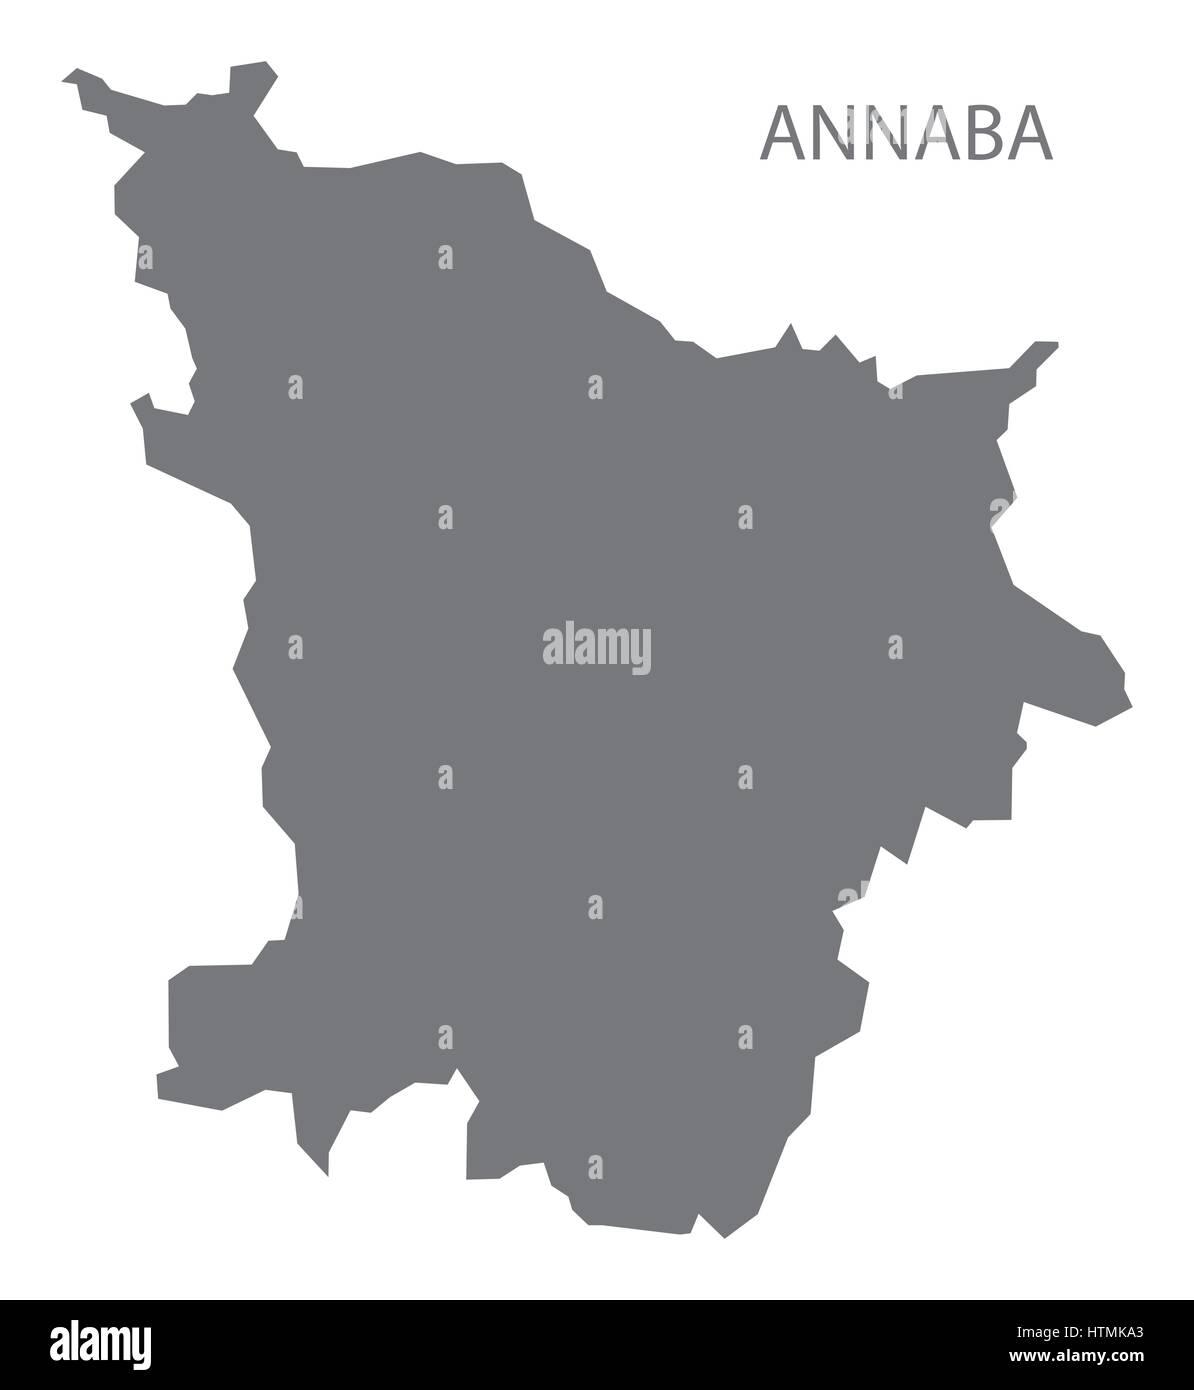 Annaba Algeria map grey illustration silhouette Stock Vector Art